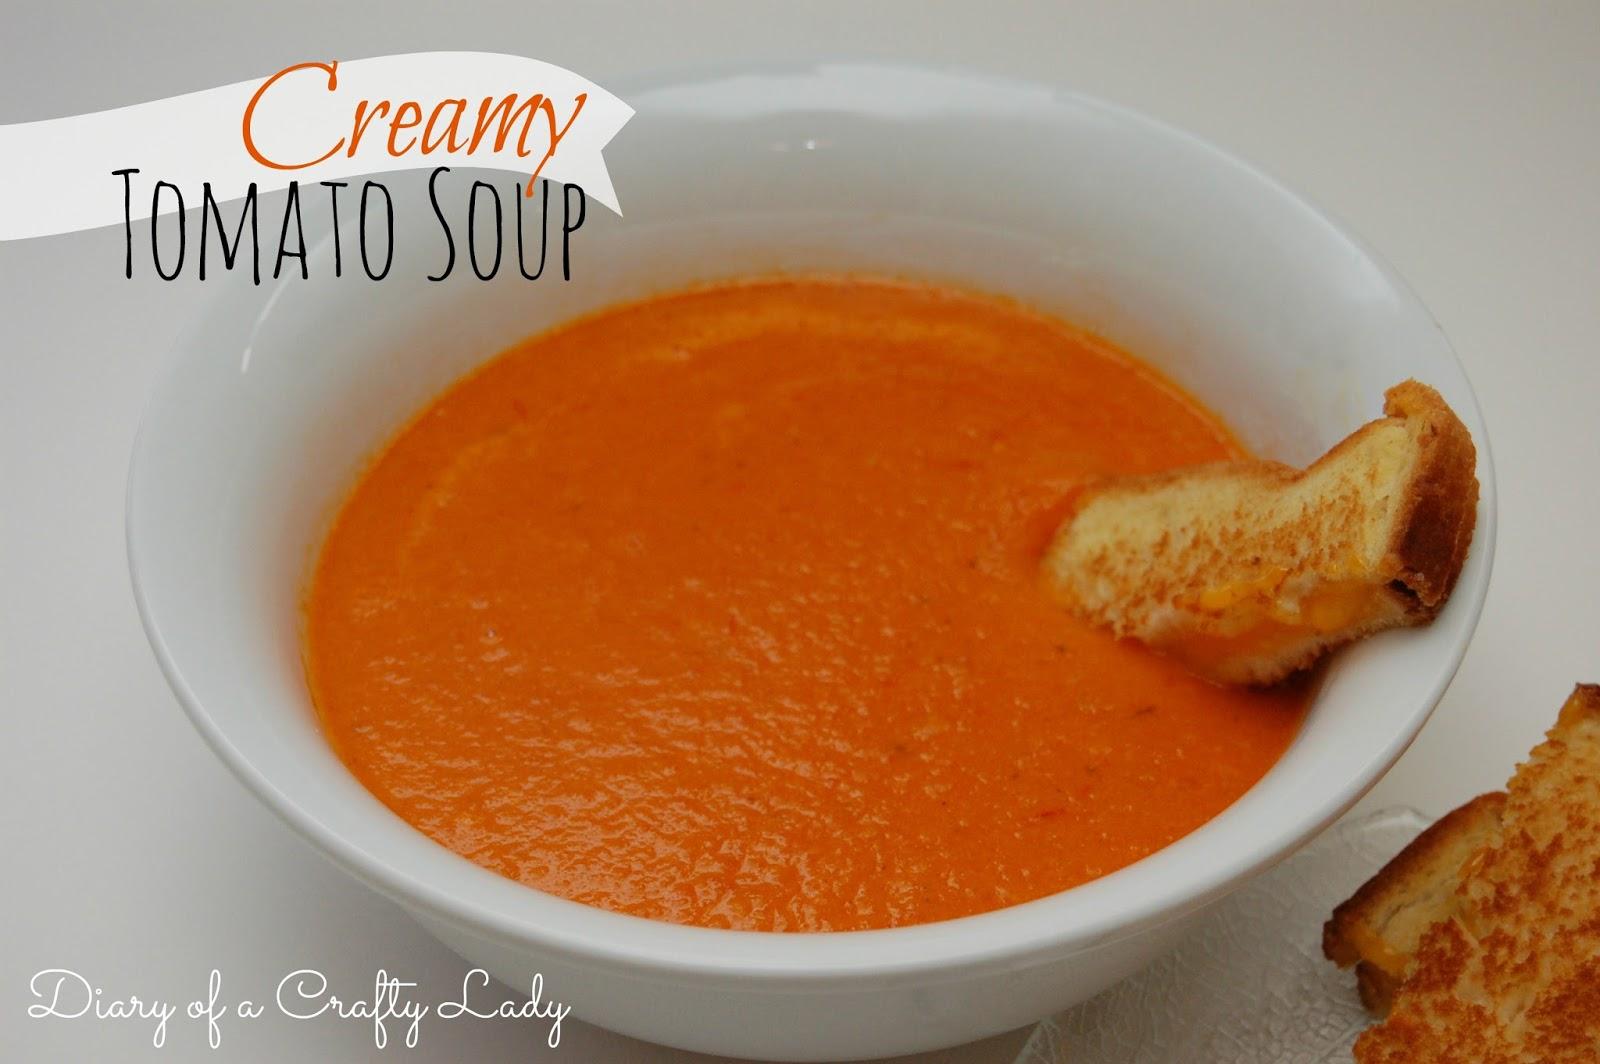 Diary of a Crafty Lady: Creamy Tomato Soup {Recipe}